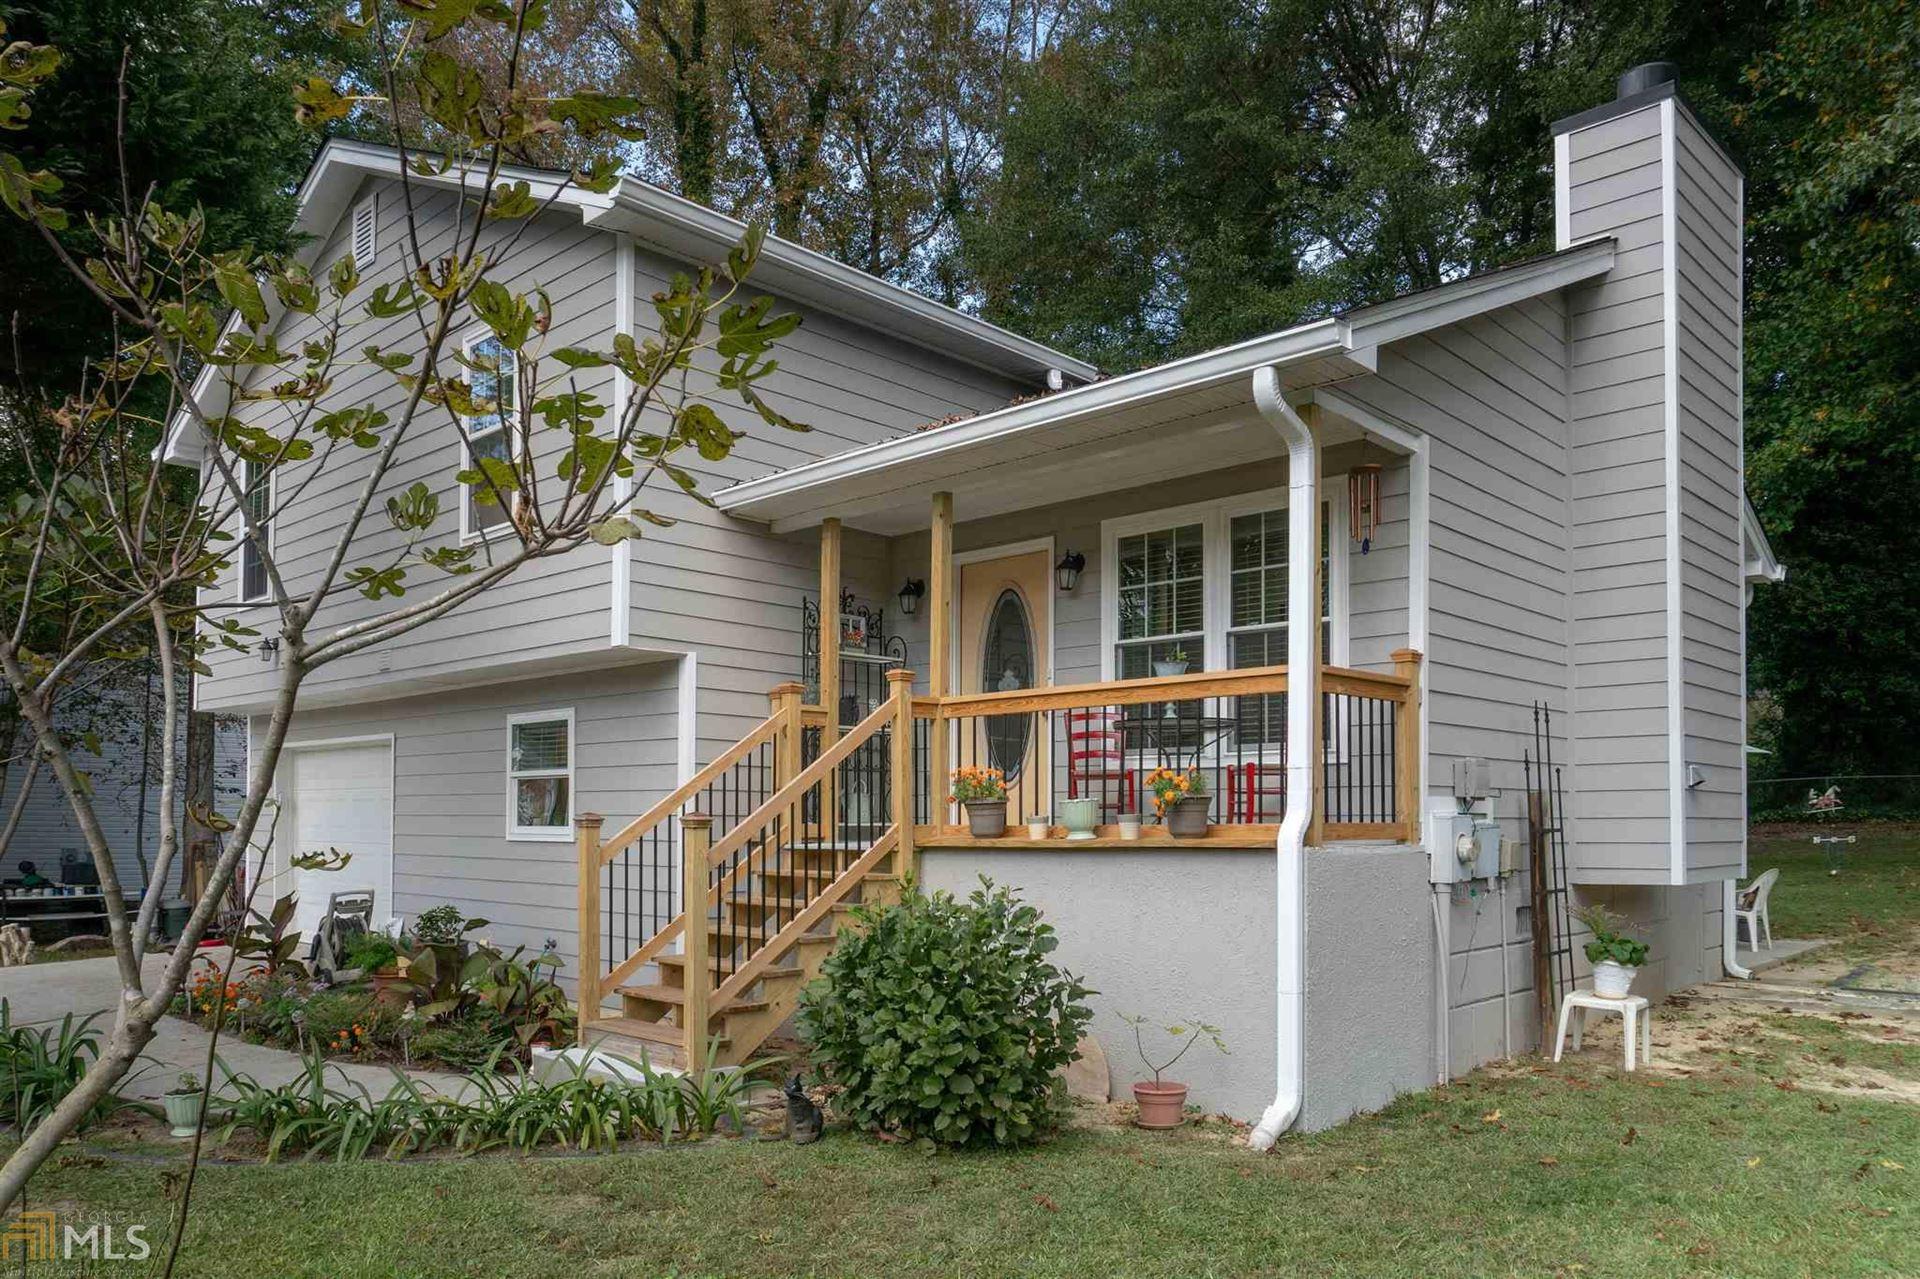 1488 Ridgewood Pl, Lawrenceville, GA 30043 - #: 8844402